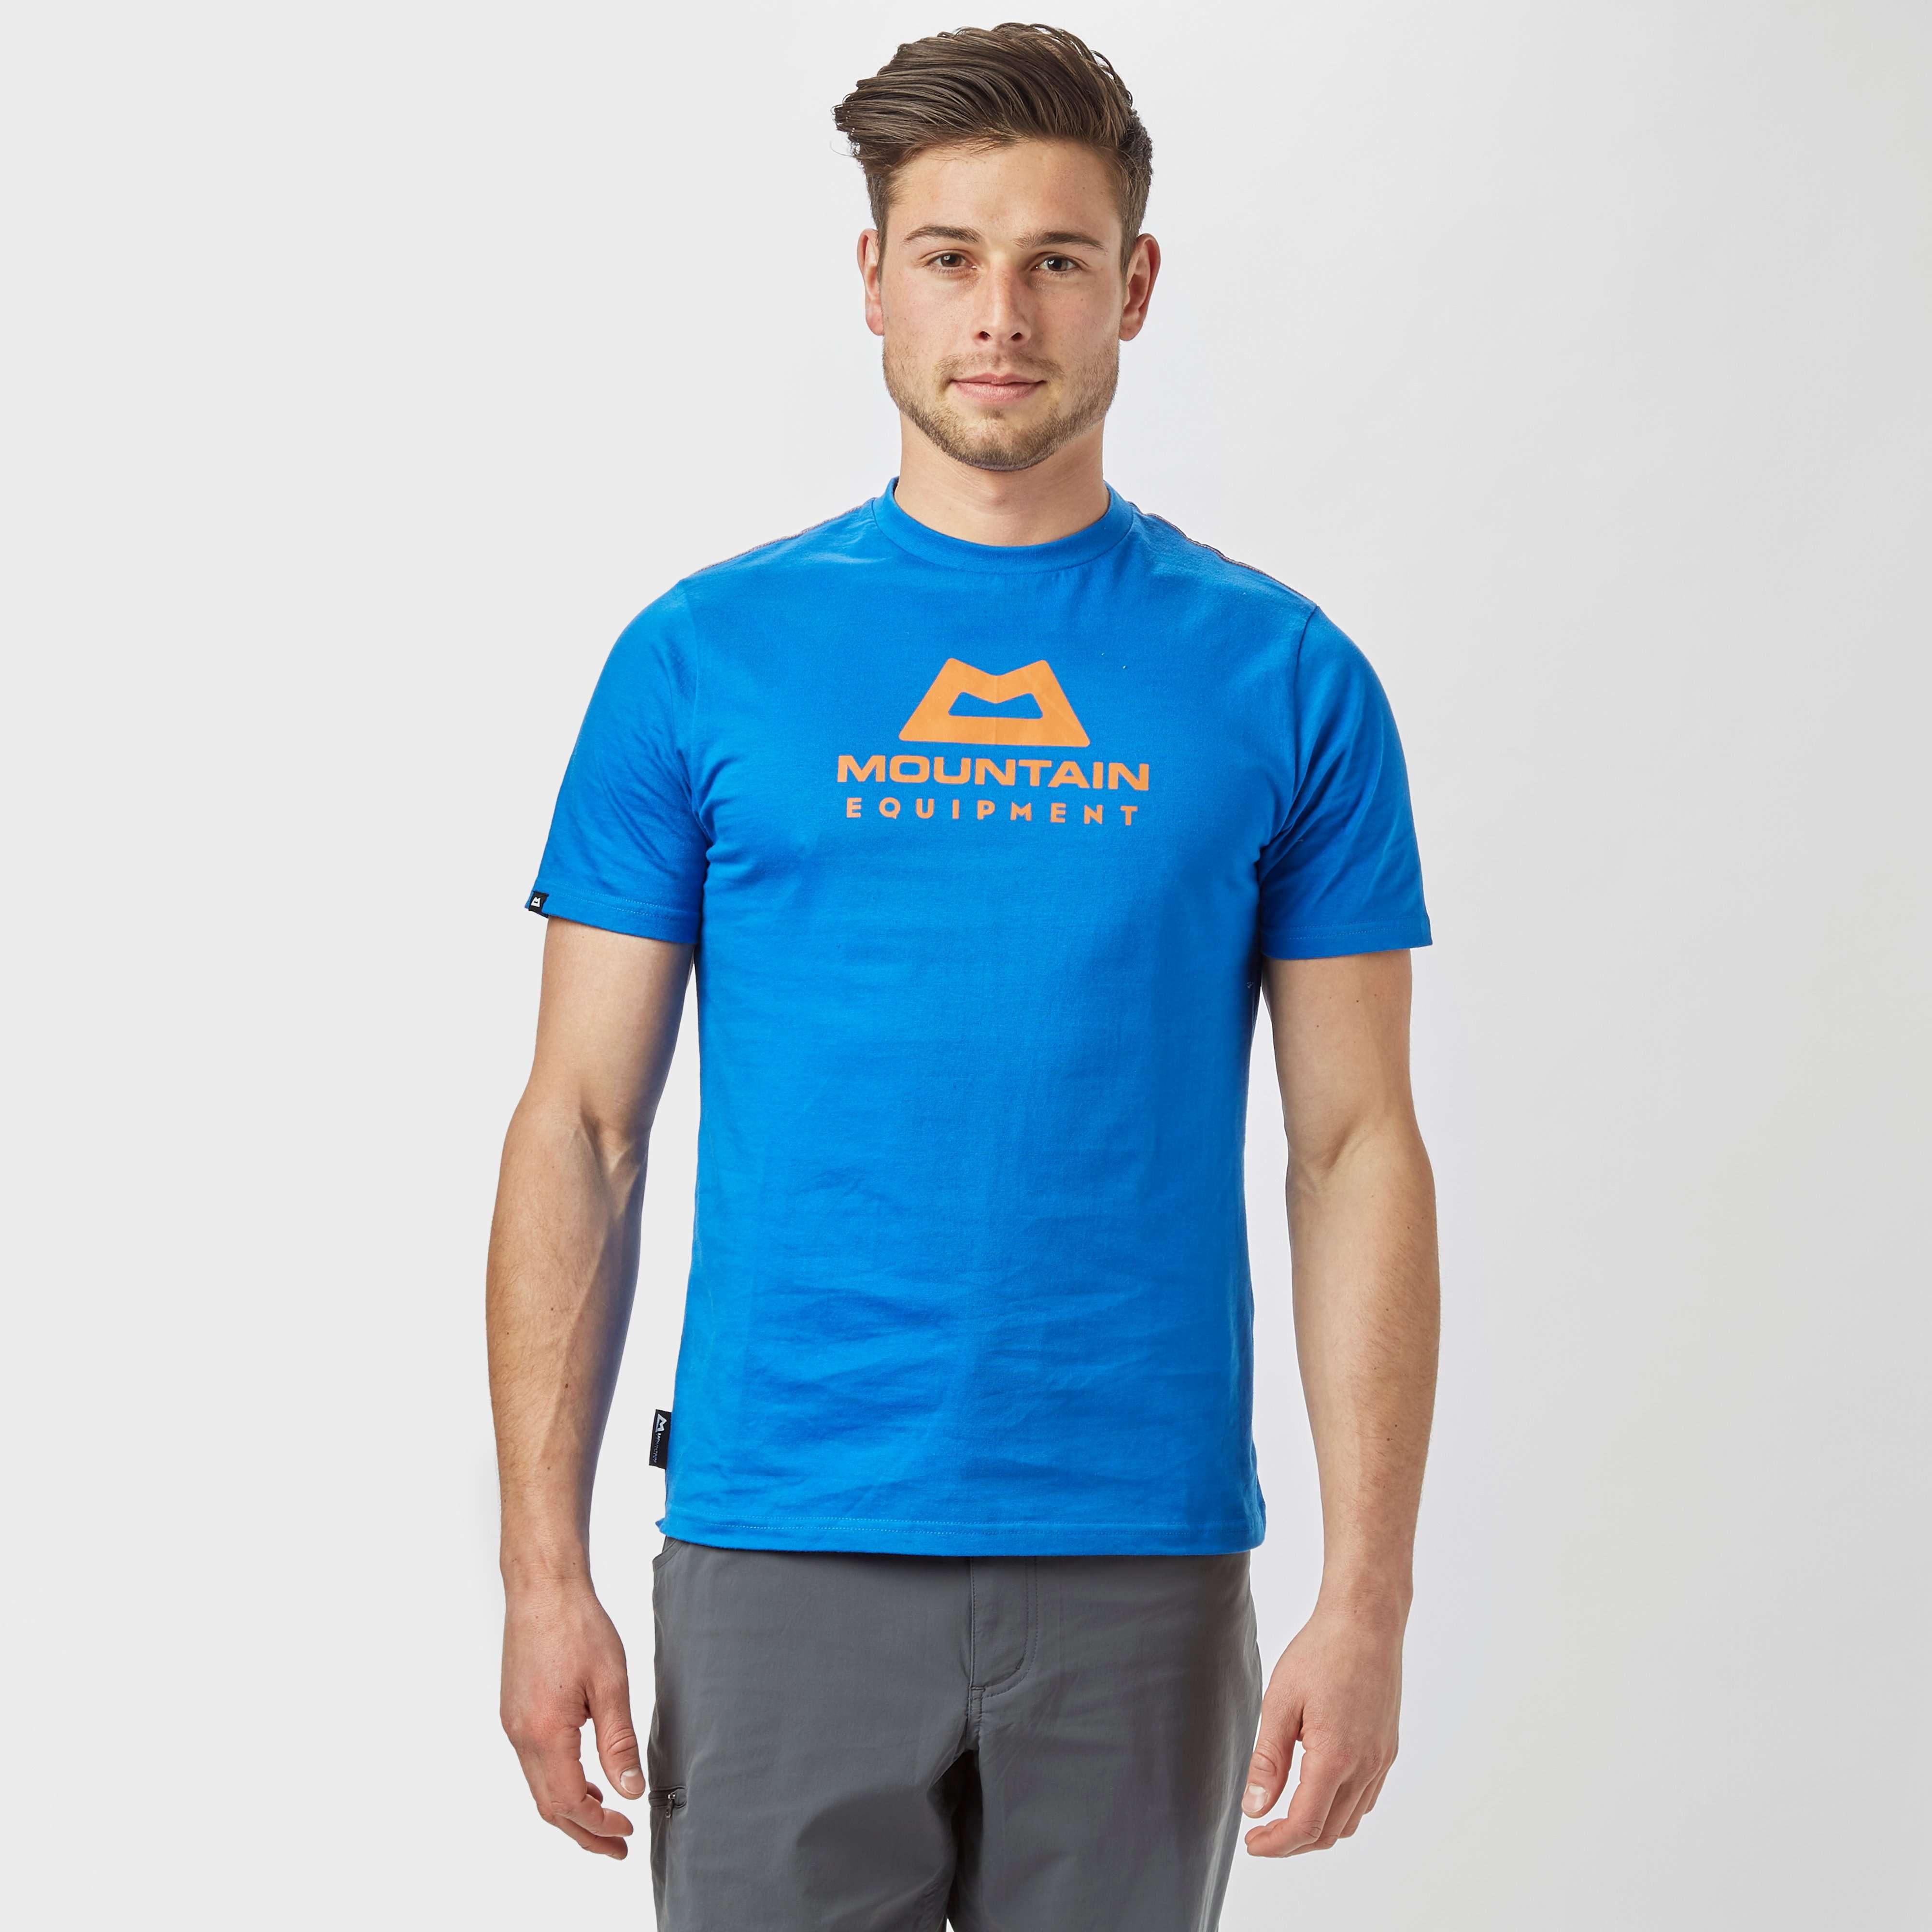 MOUNTAIN EQUIPMENT Men's Front Logo T-Shirt